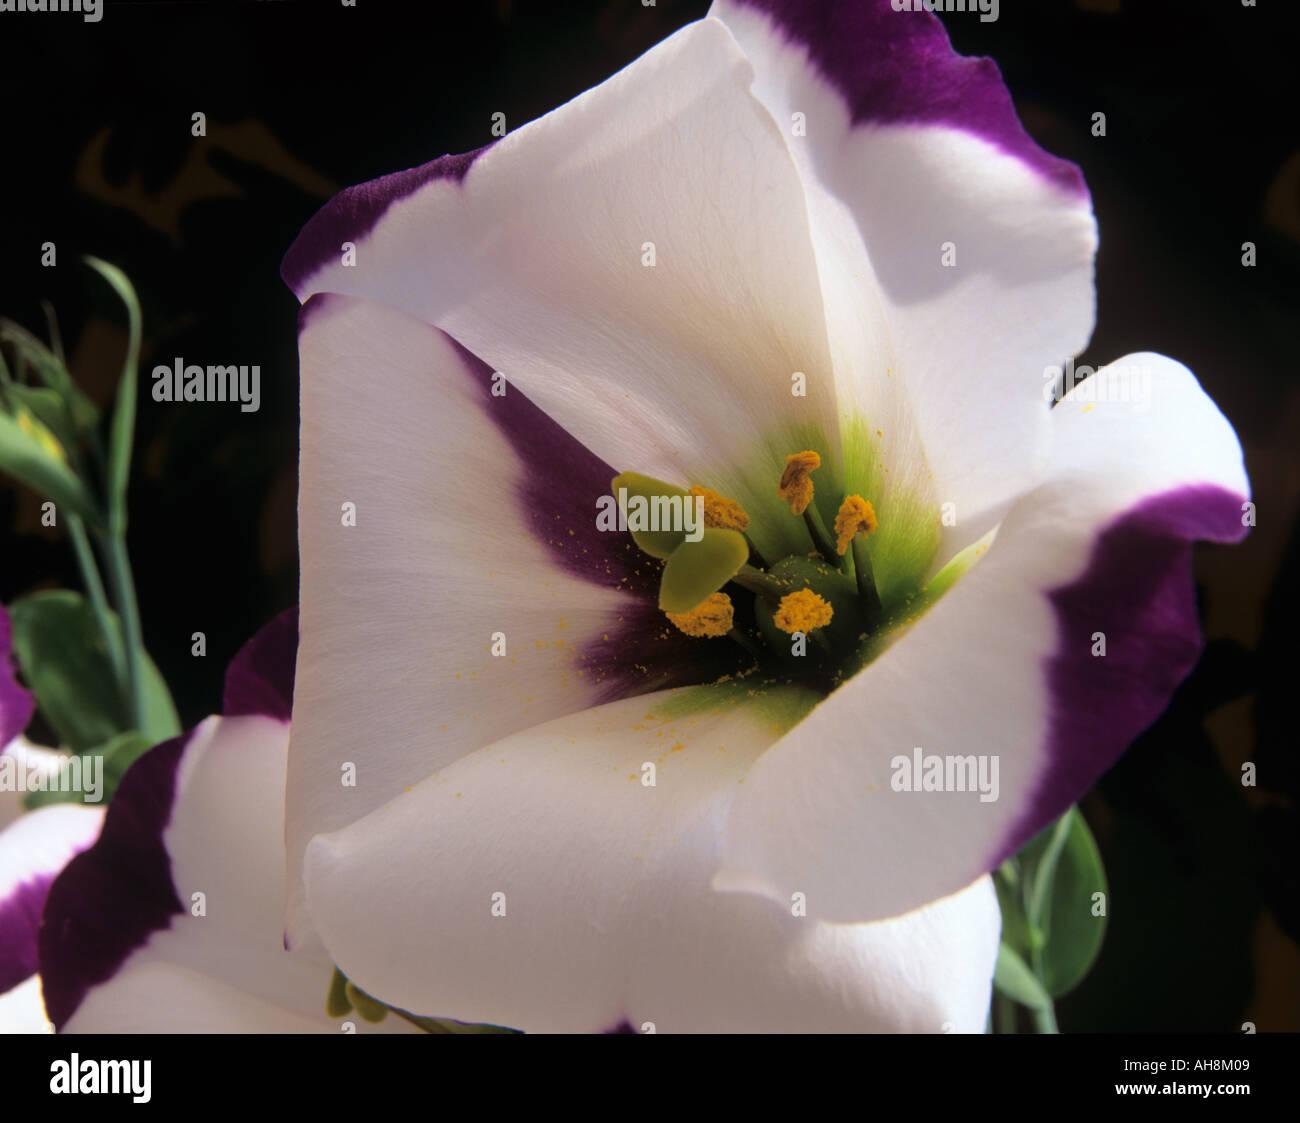 STUDIO STILL LIFE Close up image of a purple and white Eustoma russellianum Charm Picotee Blauw Prairie Gentian - Stock Image